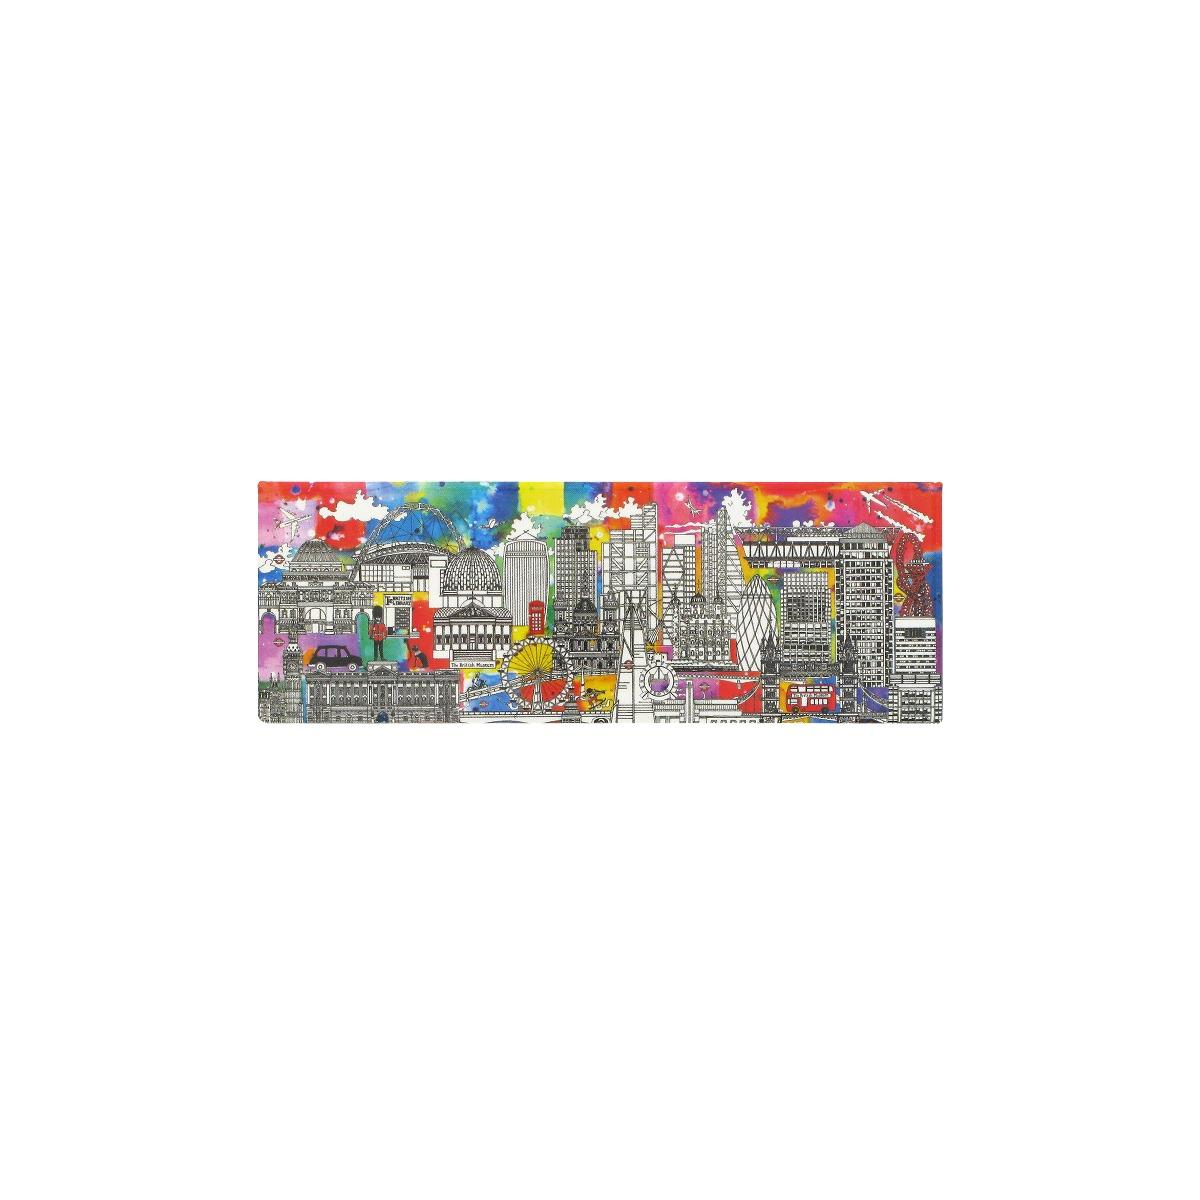 Coloursplash magnet